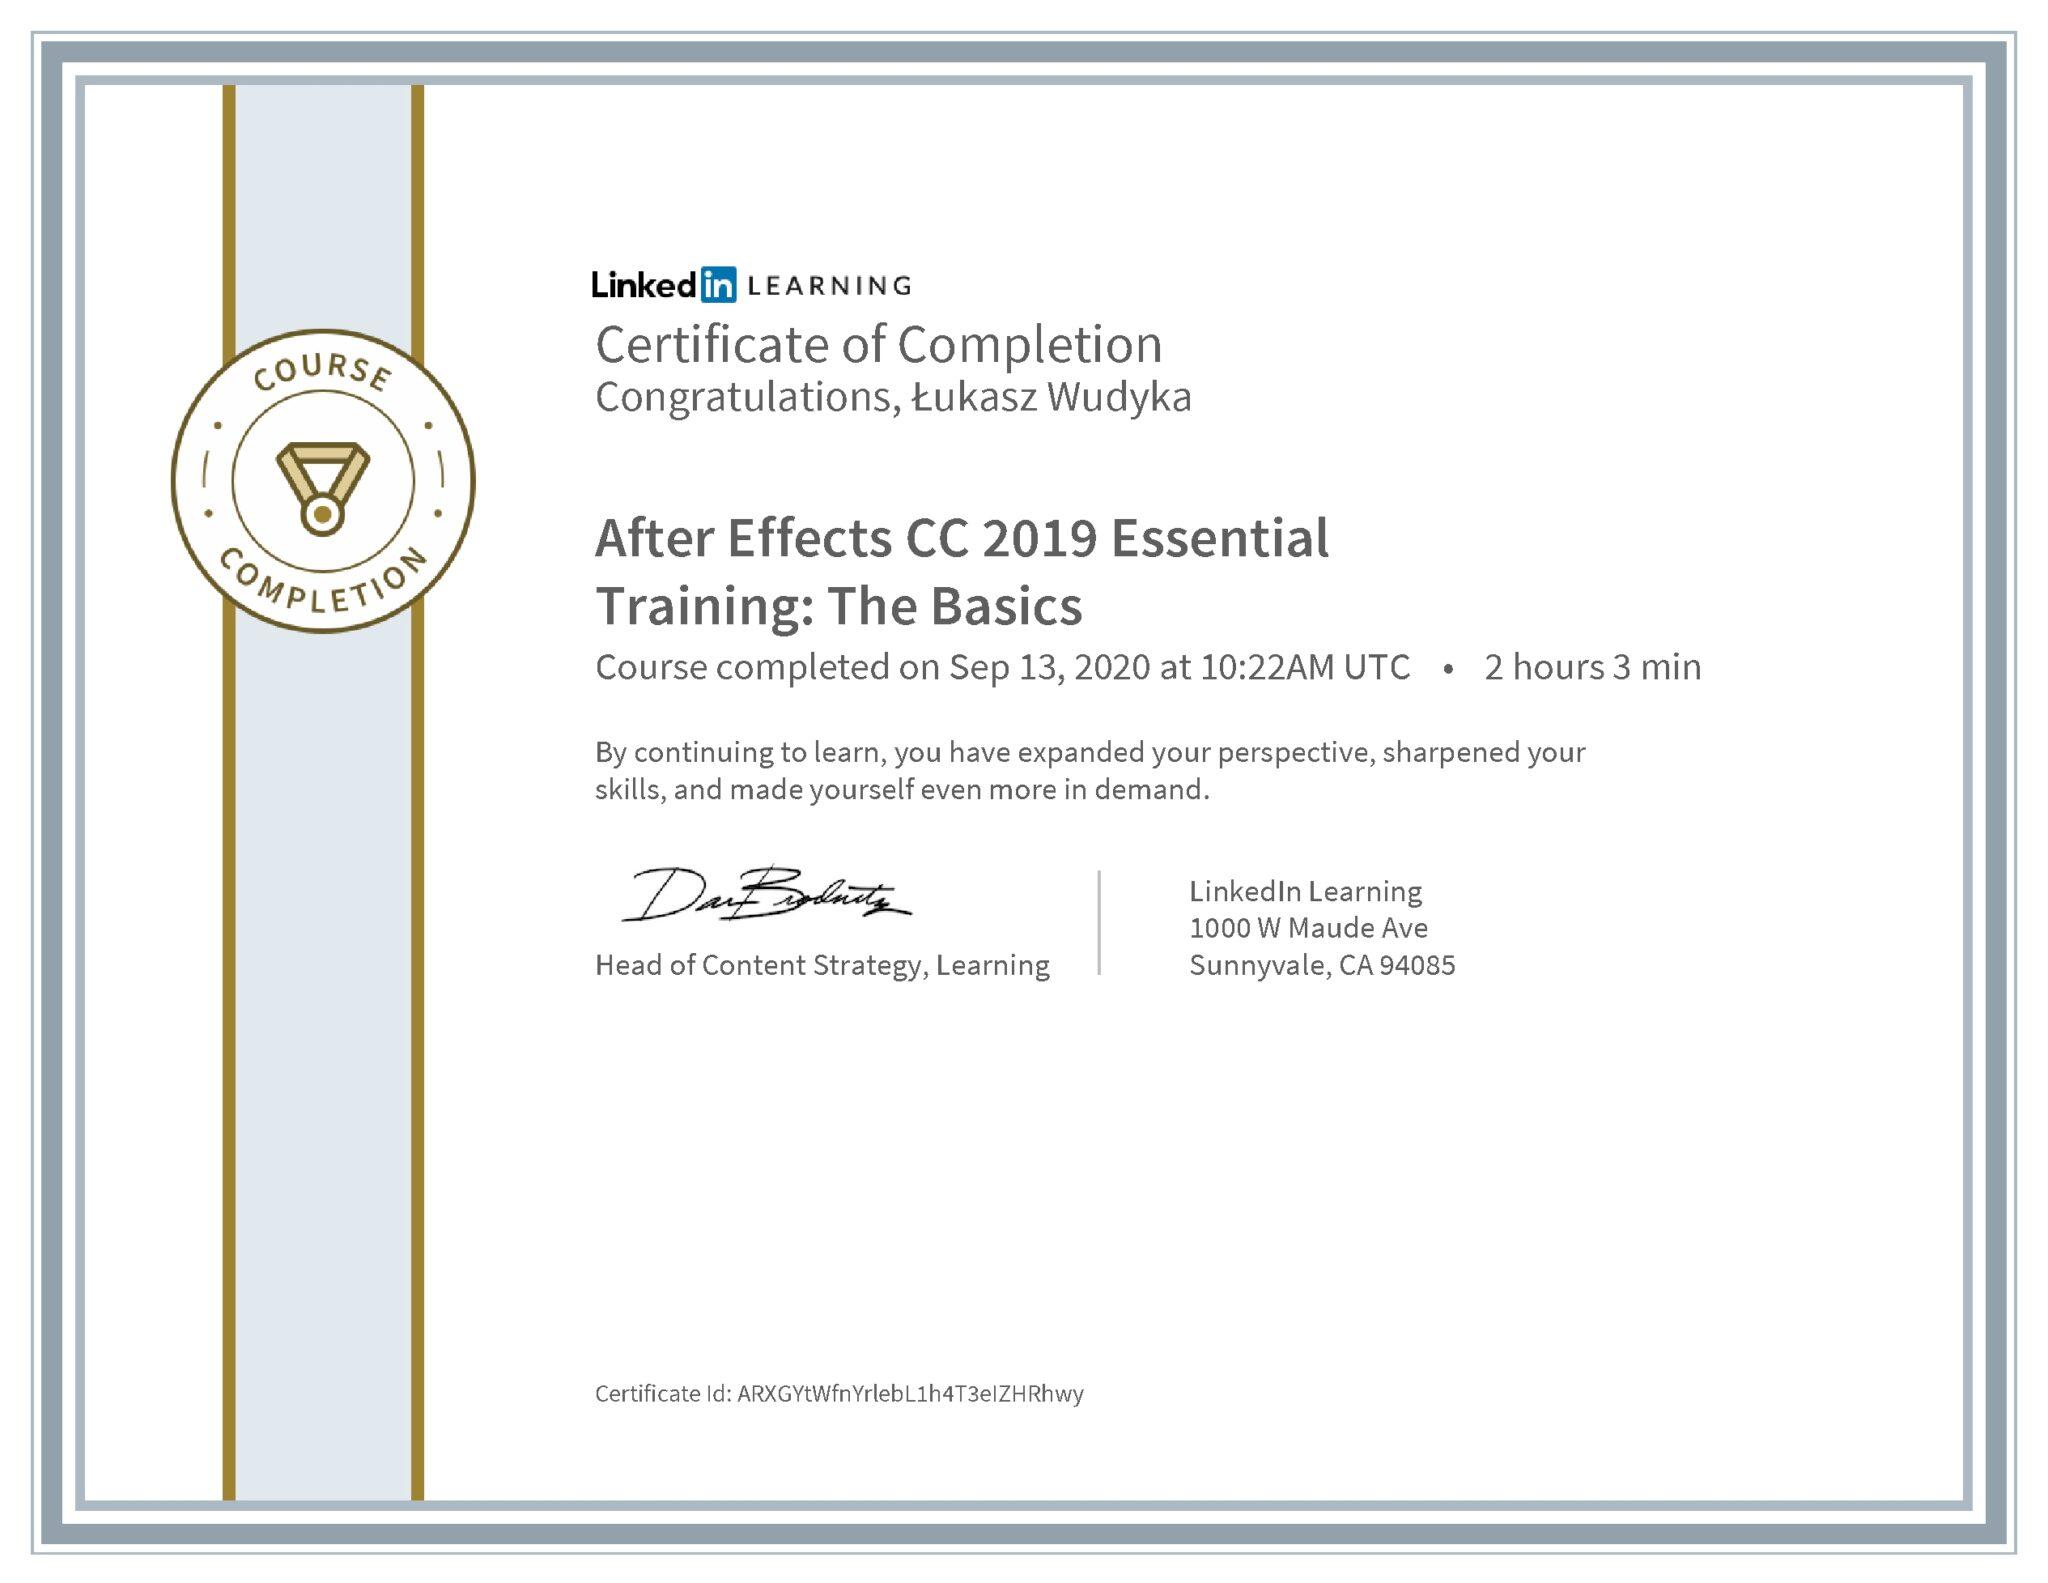 Łukasz Wudyka certyfikat LinkedIn After Effects CC 2019 Essential Training: The Basics